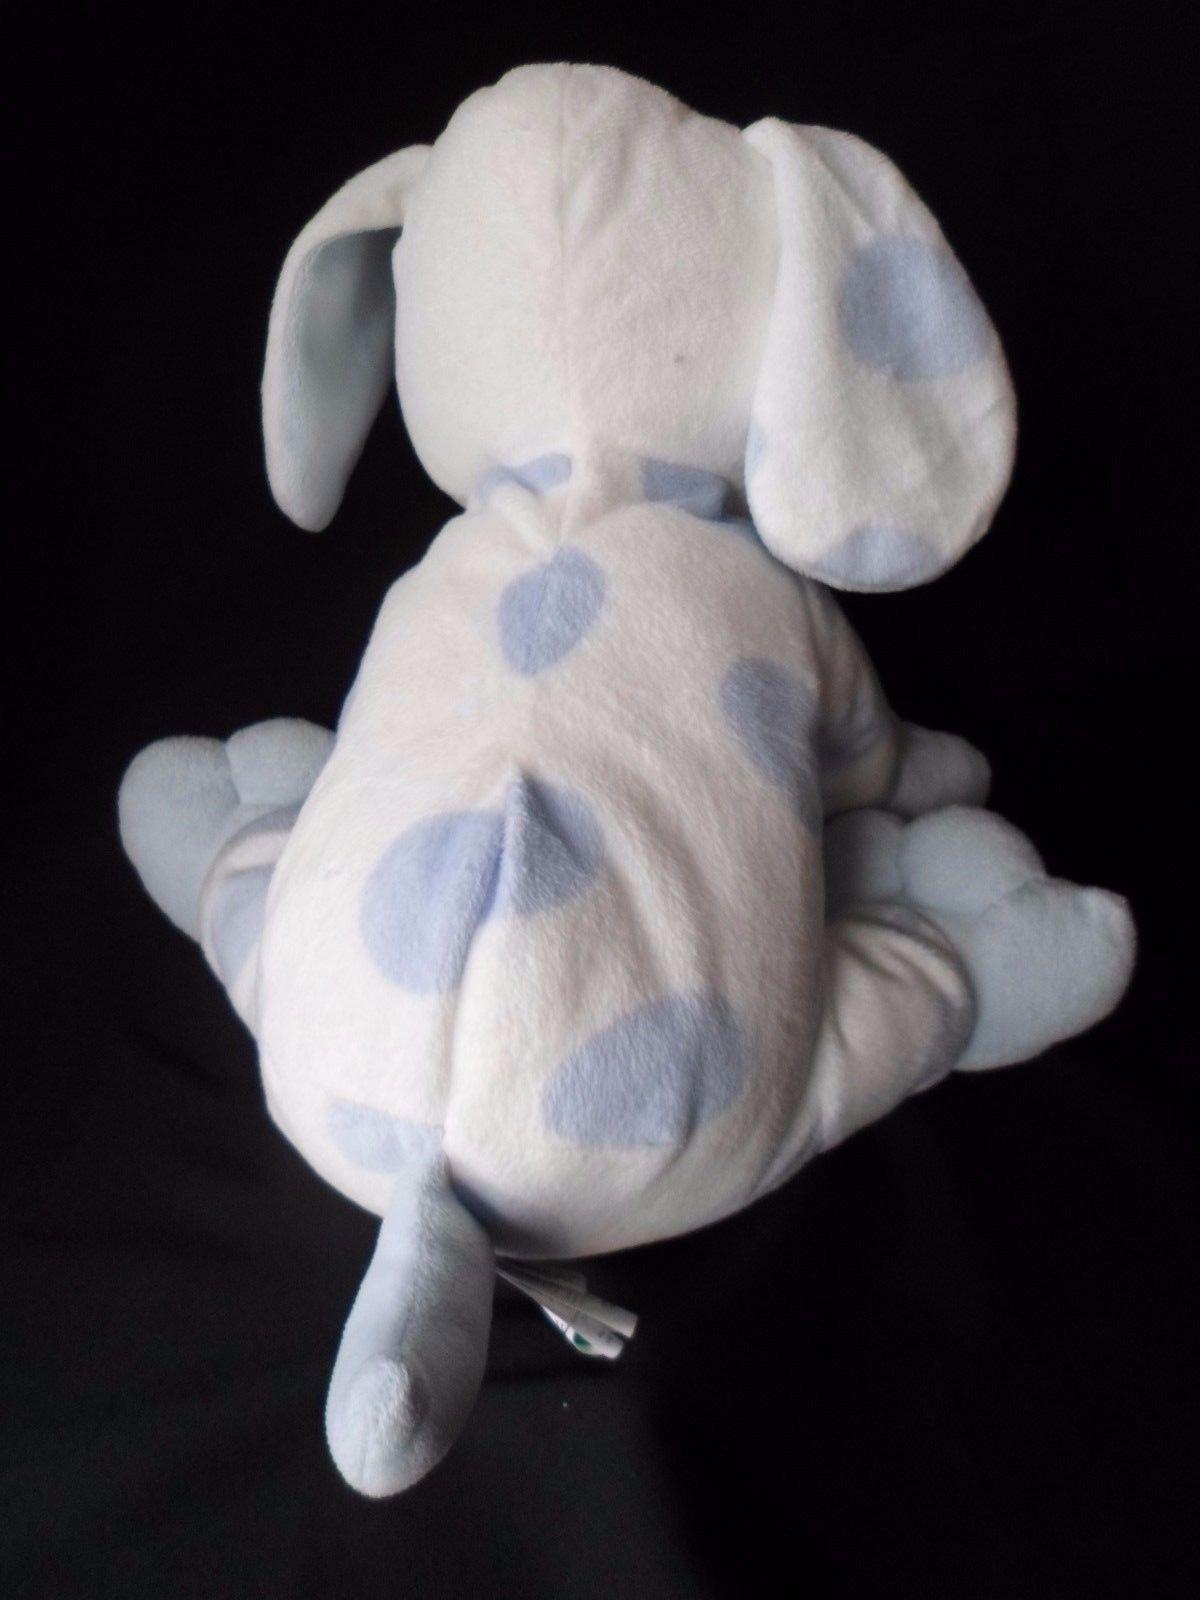 Kids Preferred White Blue Spot Puppy Dog Plush Asthma Allergy Friendly 9'